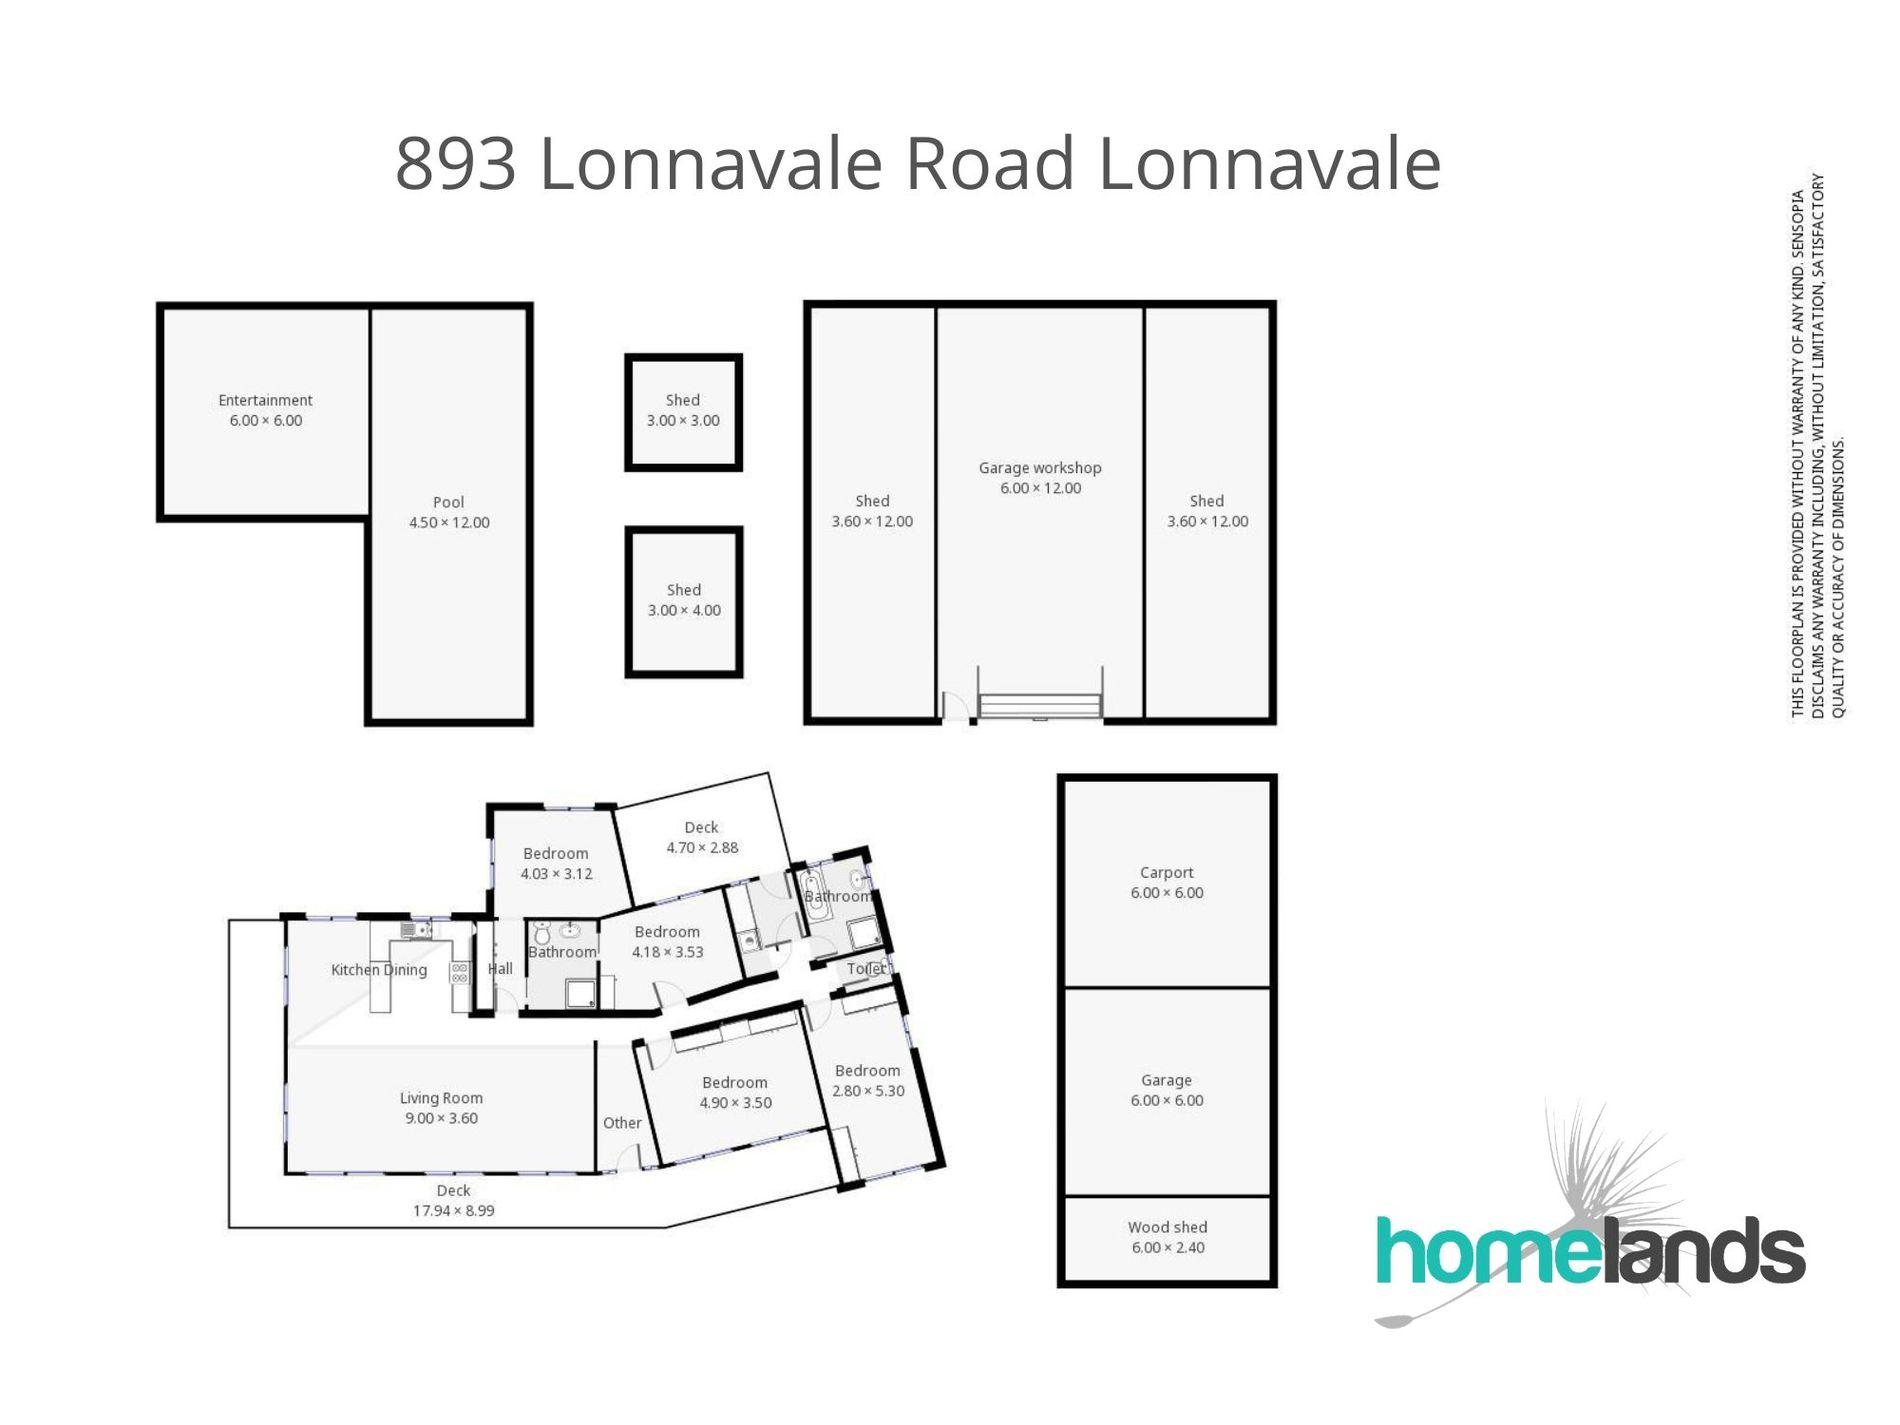 893 Lonnavale Road, Lonnavale